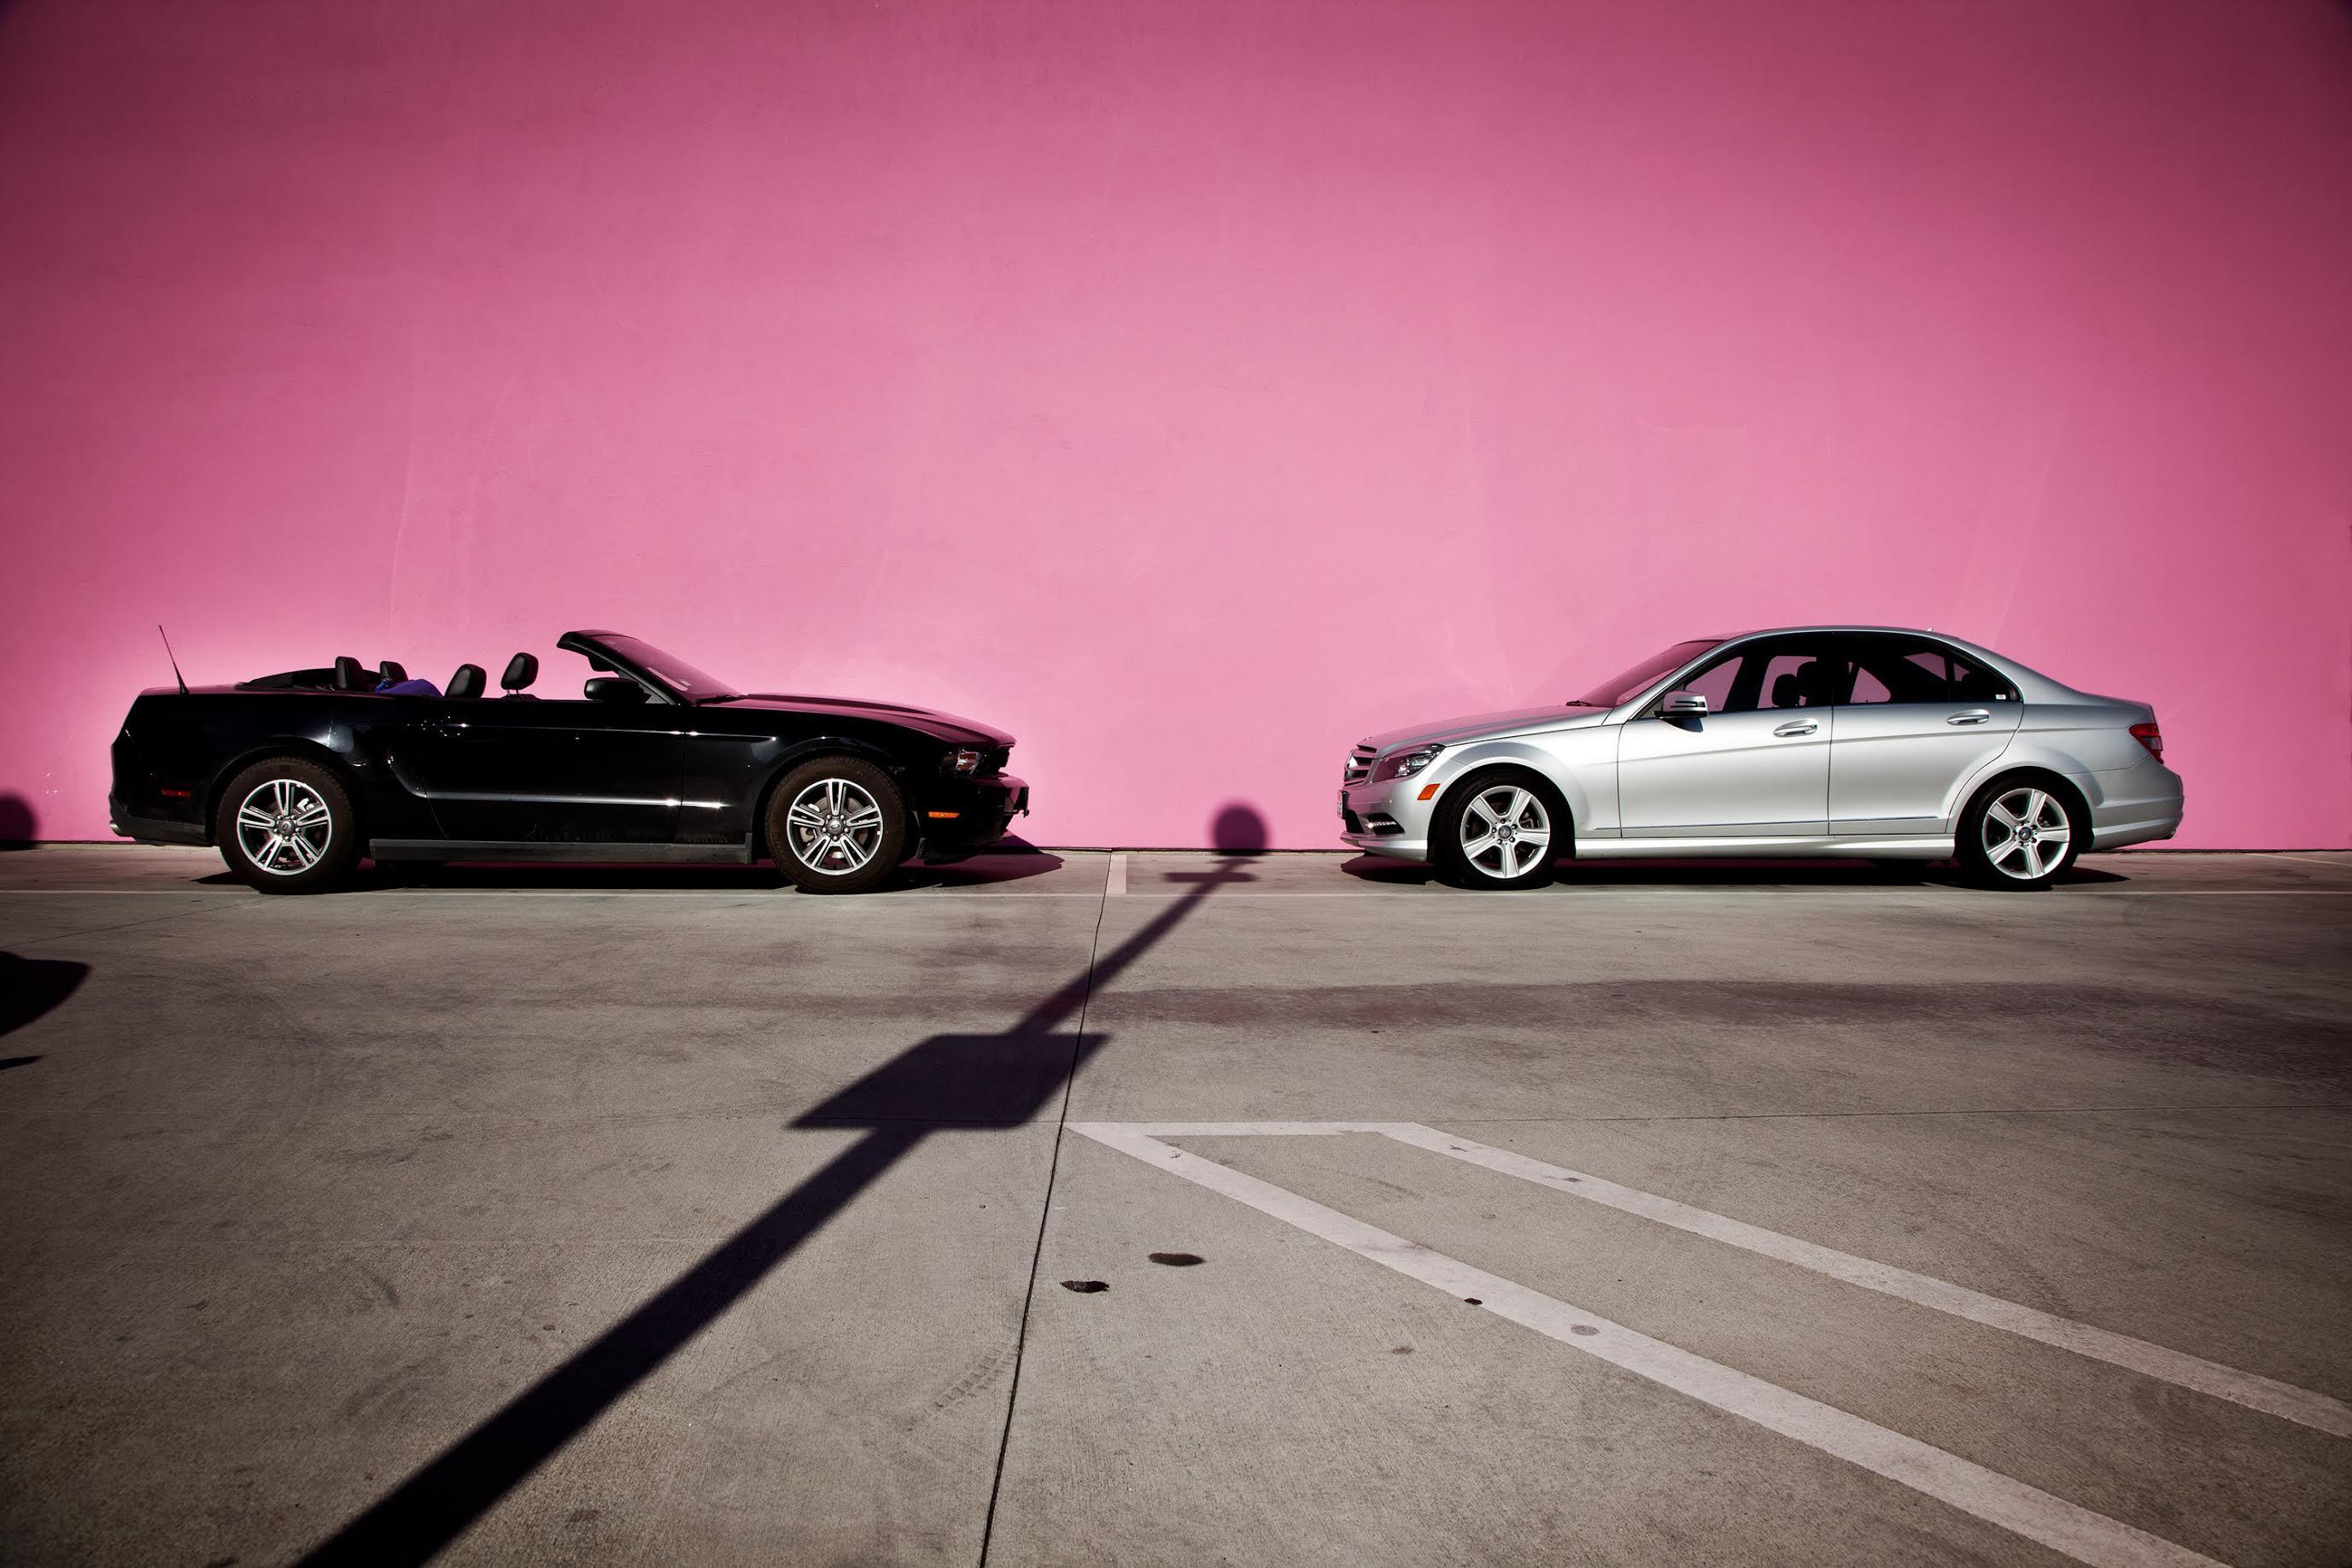 pink wall cars.jpg